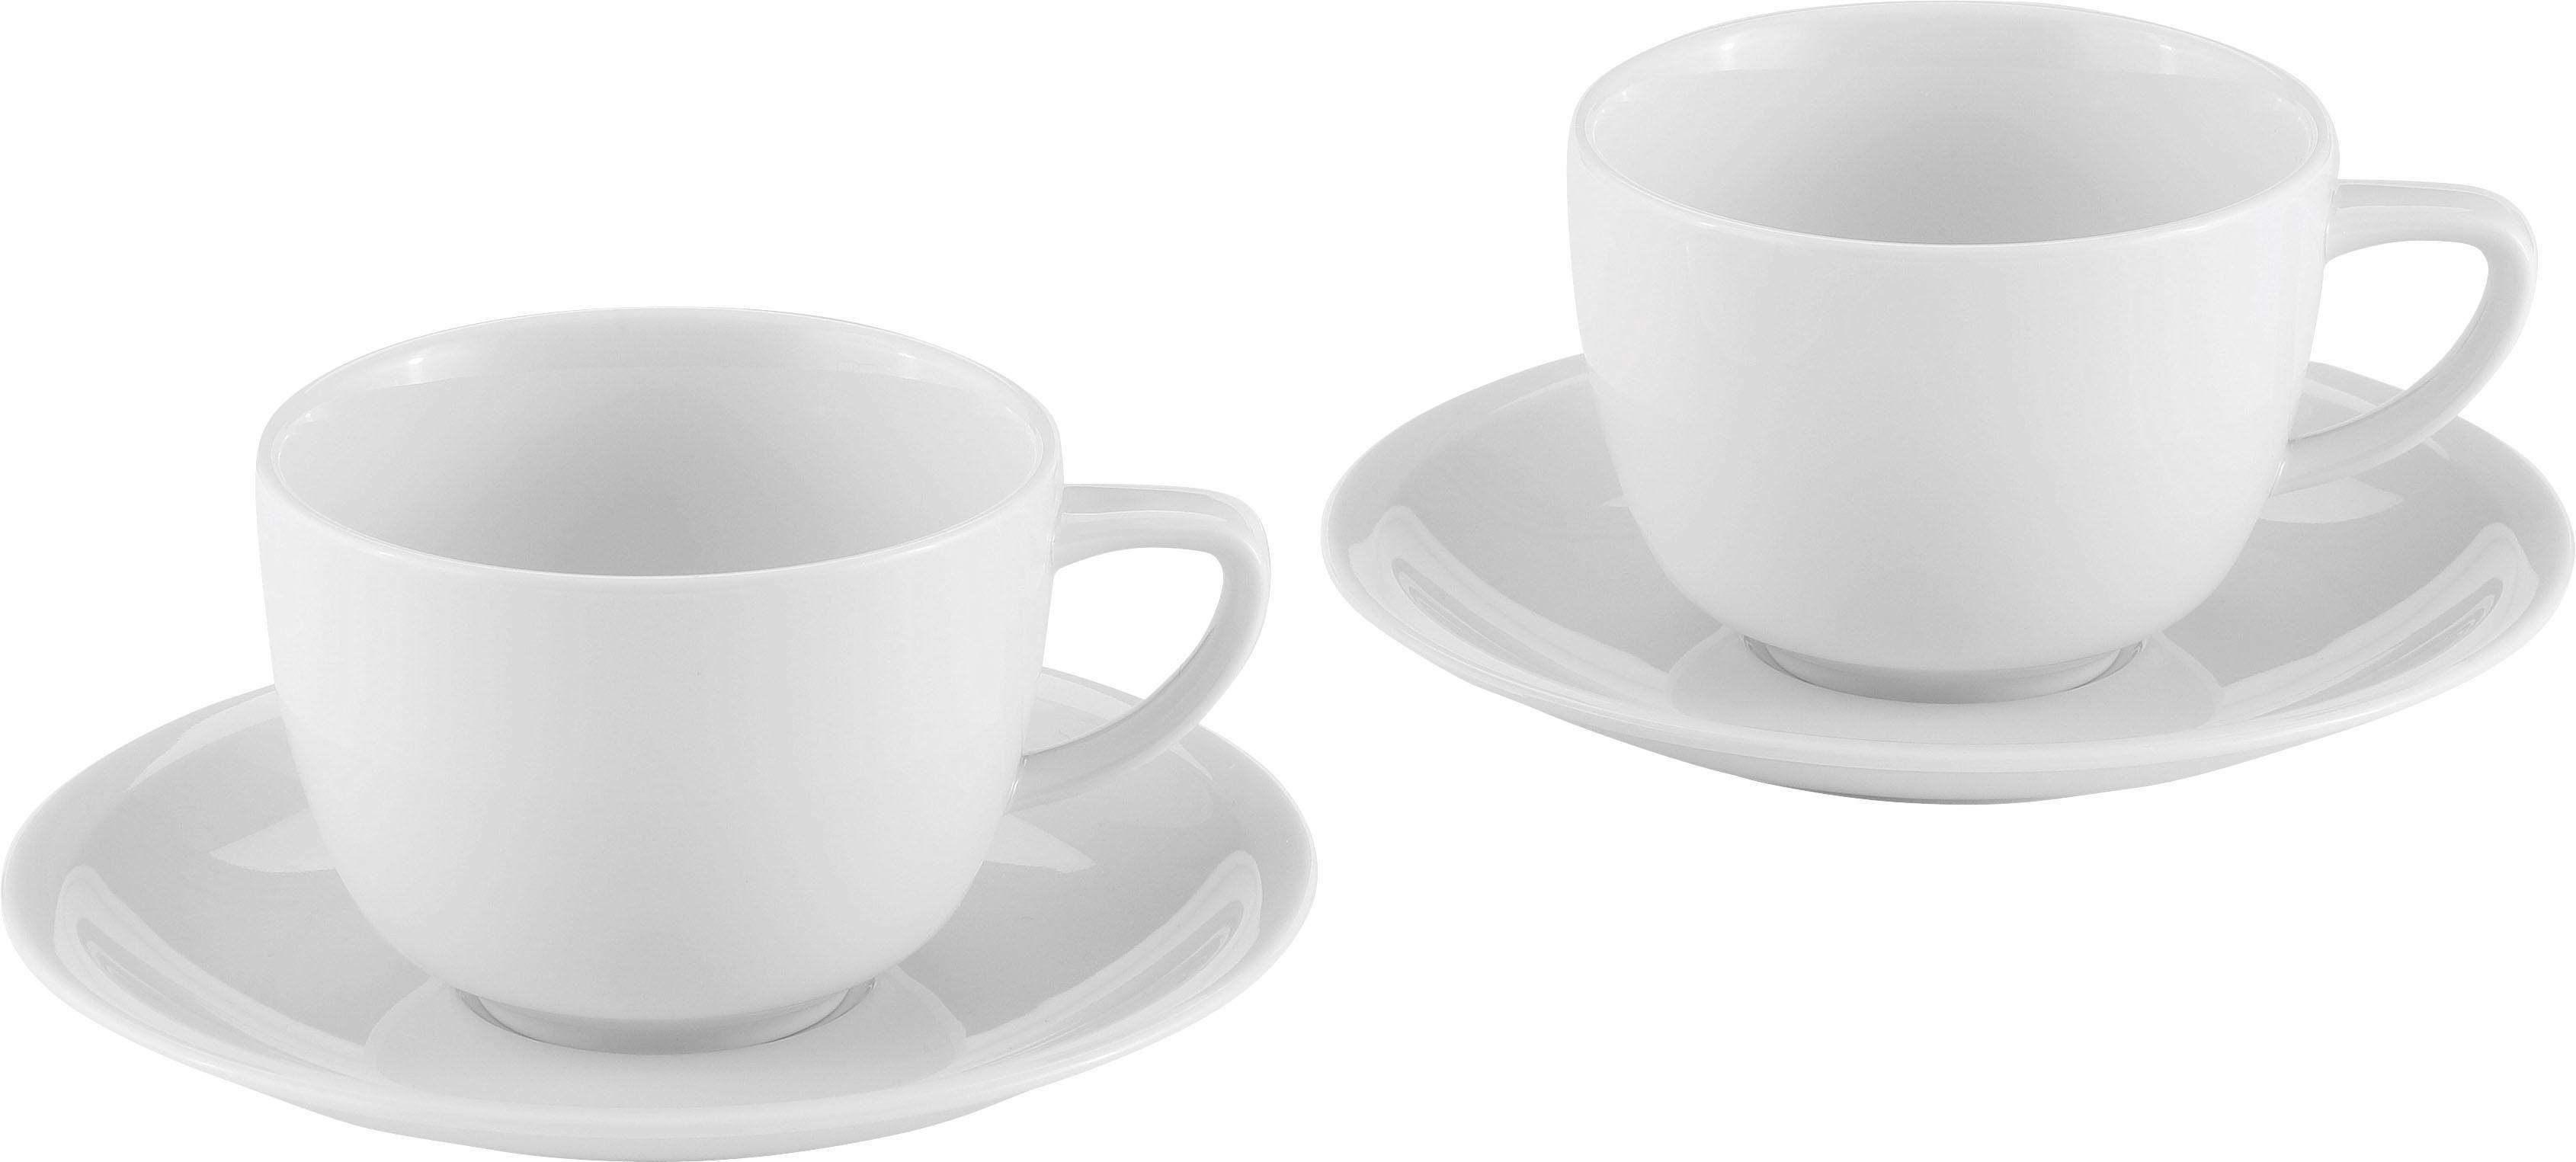 Alexander Herrmann Café au Lait-Set »CLASSIC Linie«, 4-teilig, Porzellan, Made in Germany